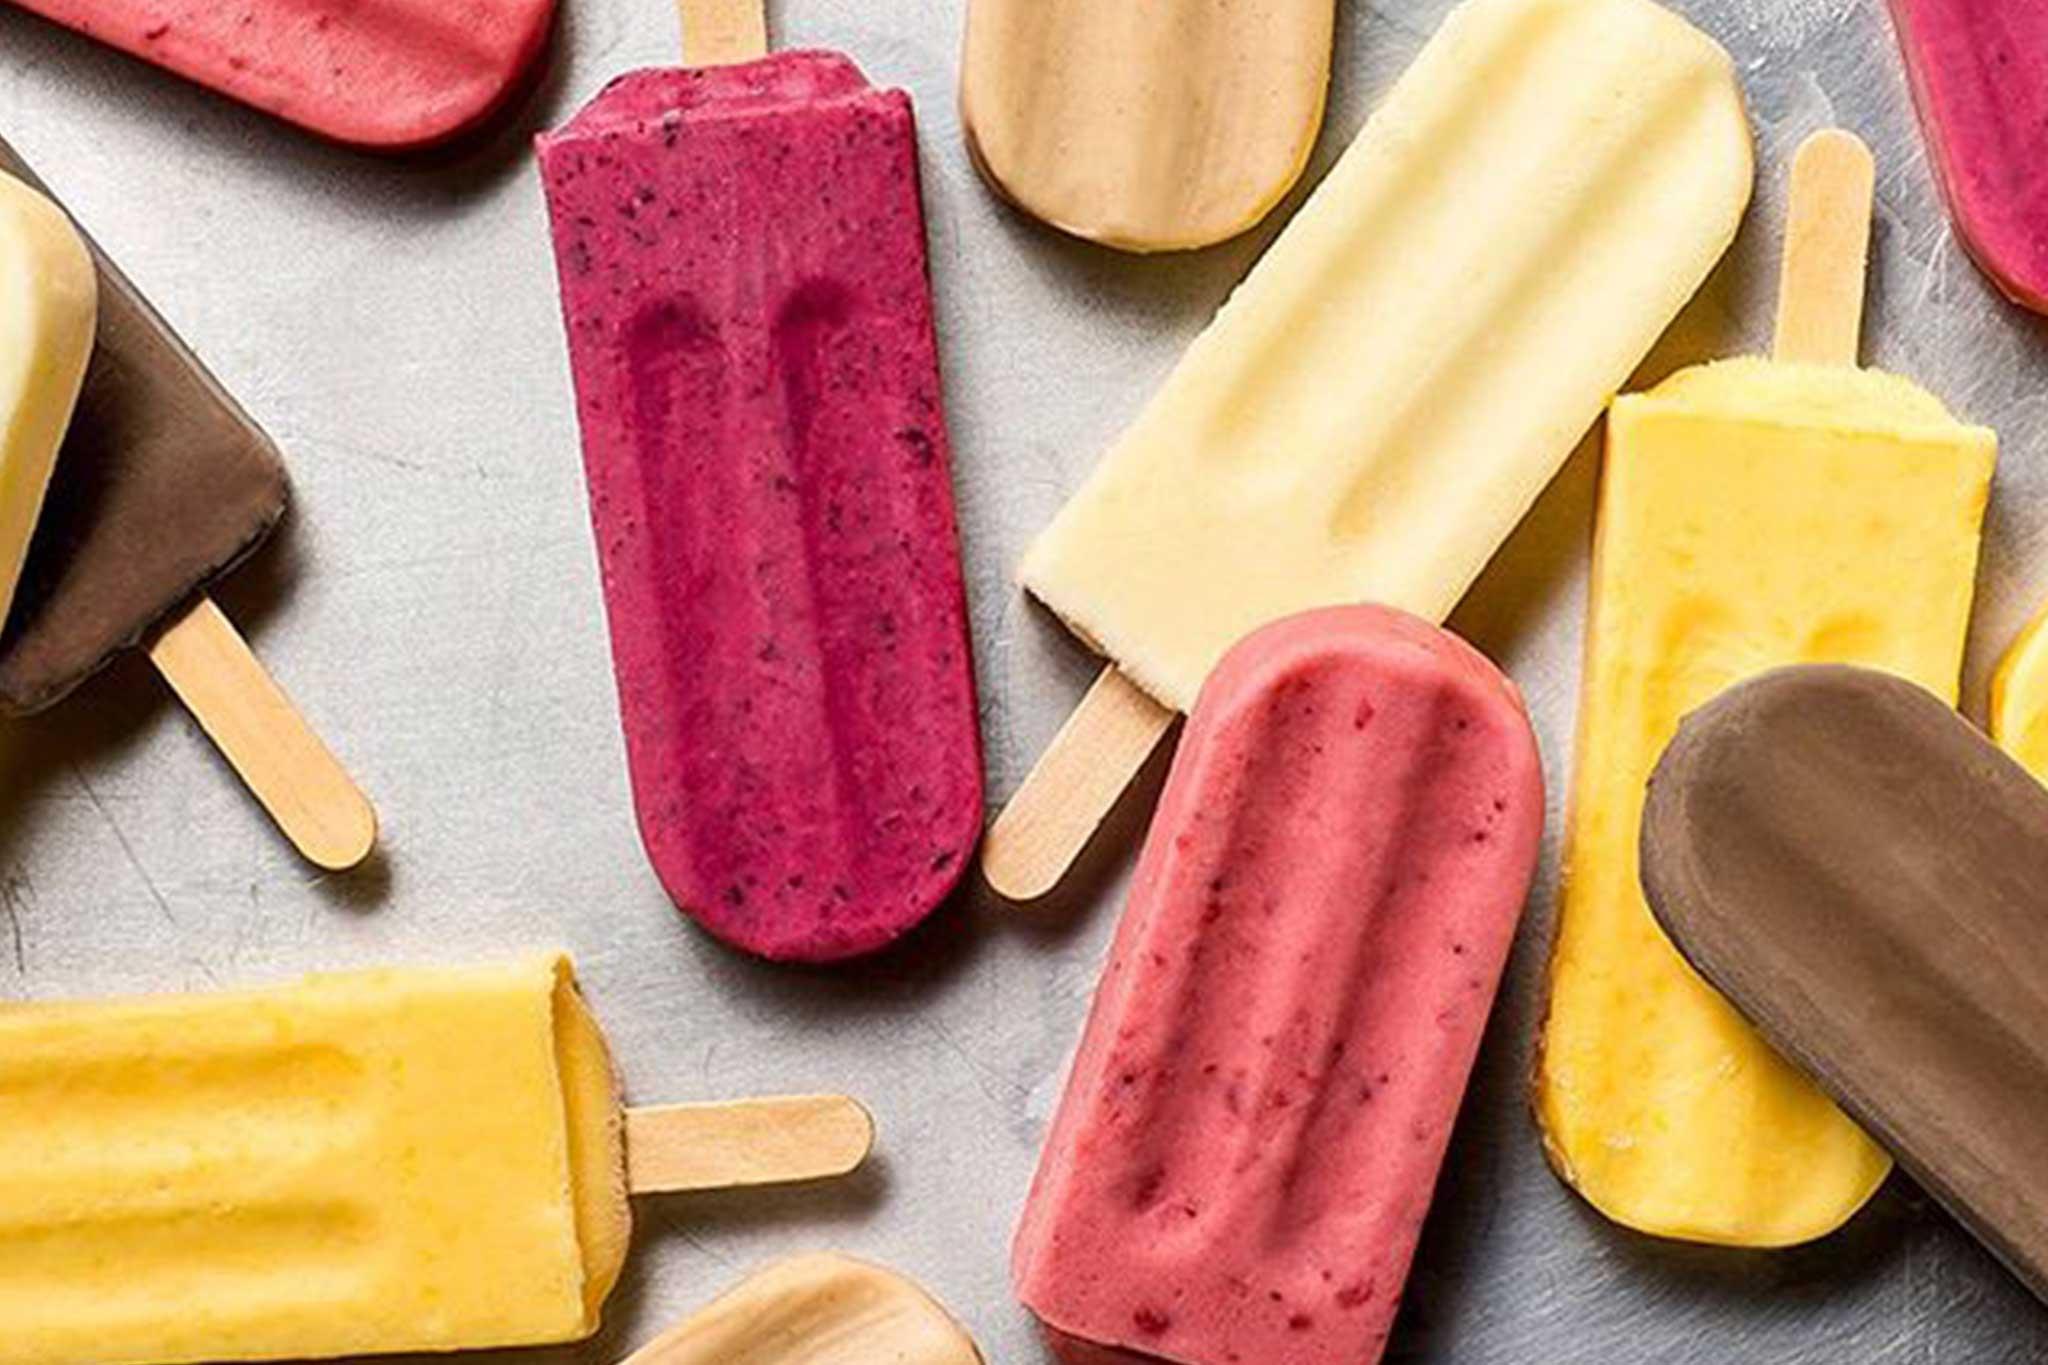 The best ice cream shops in Foodee cities